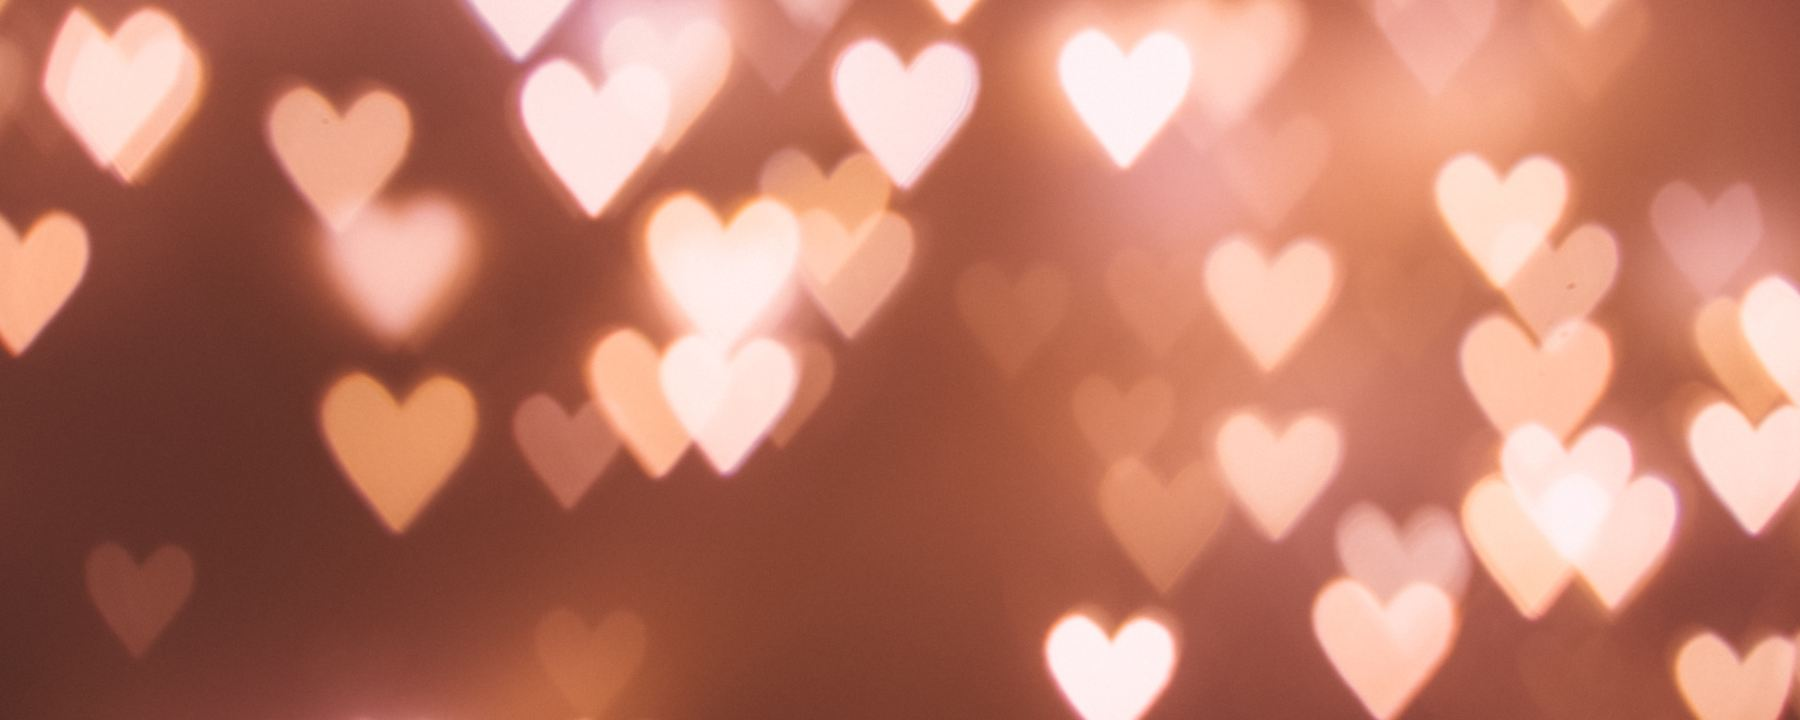 hearts, heartbeat, heart